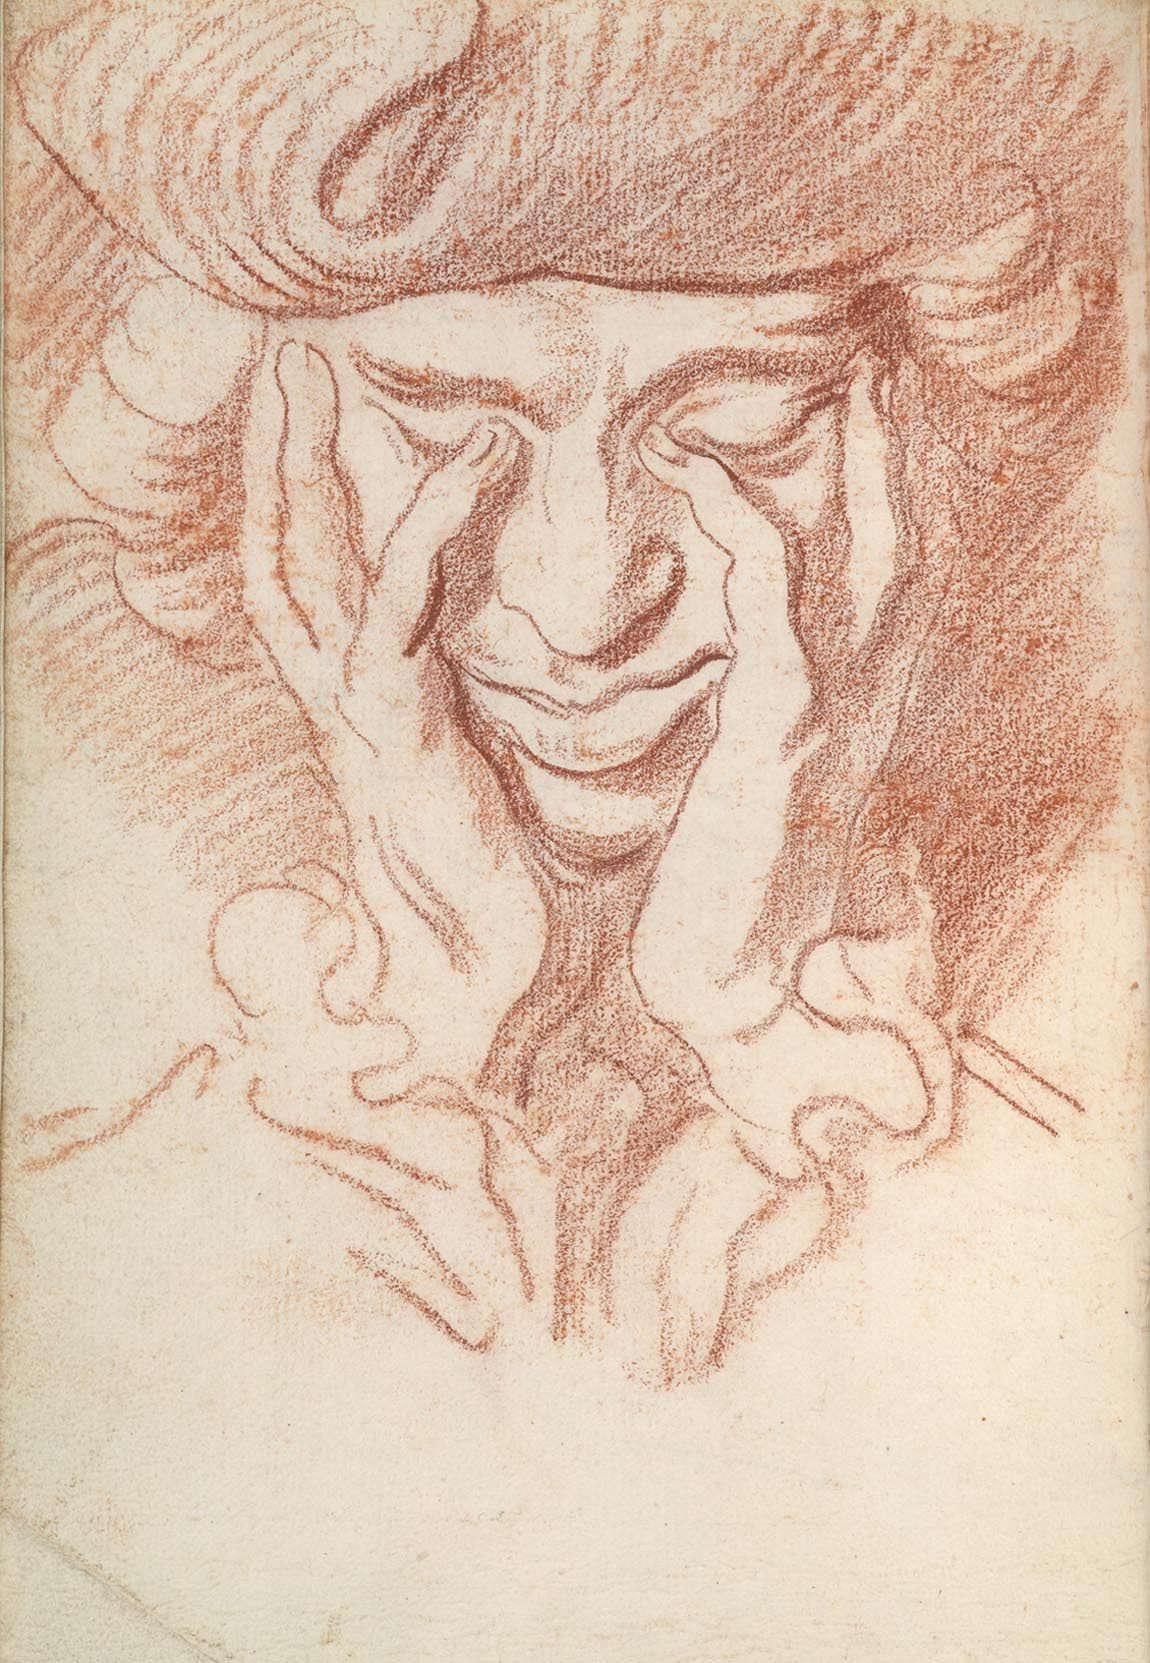 Self-Portrait / Bouchardon